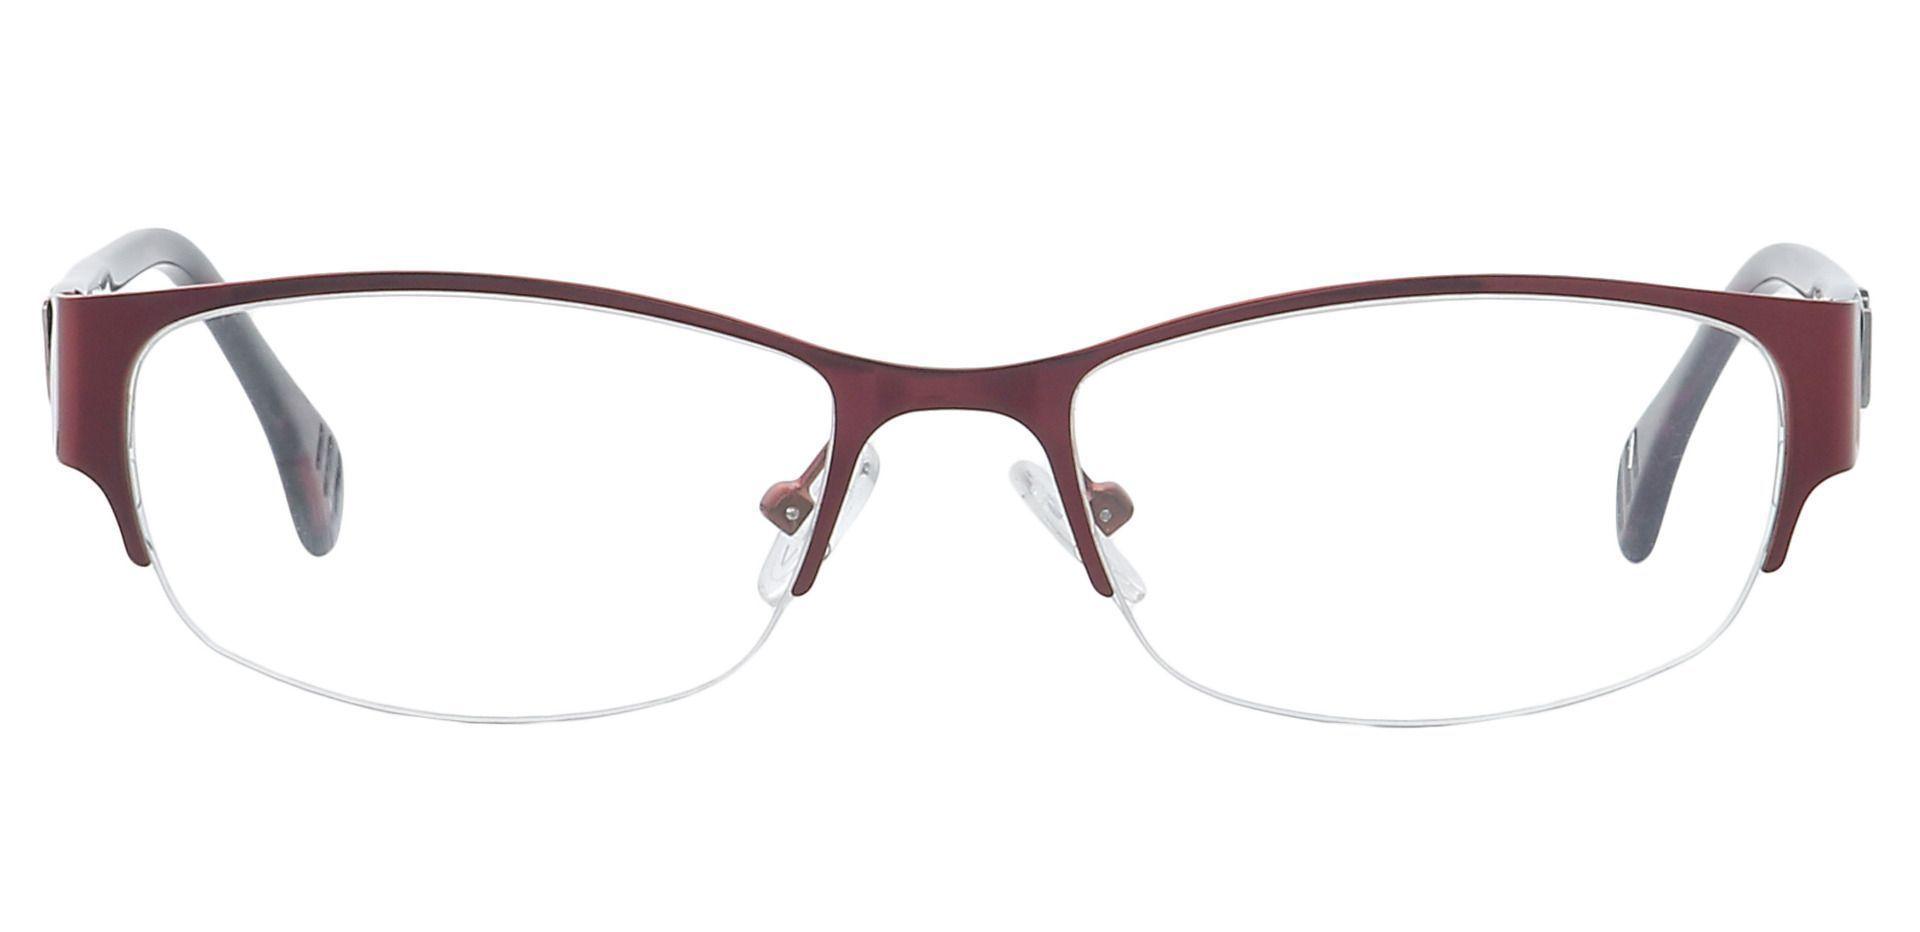 Layla Rectangle Eyeglasses Frame - Red